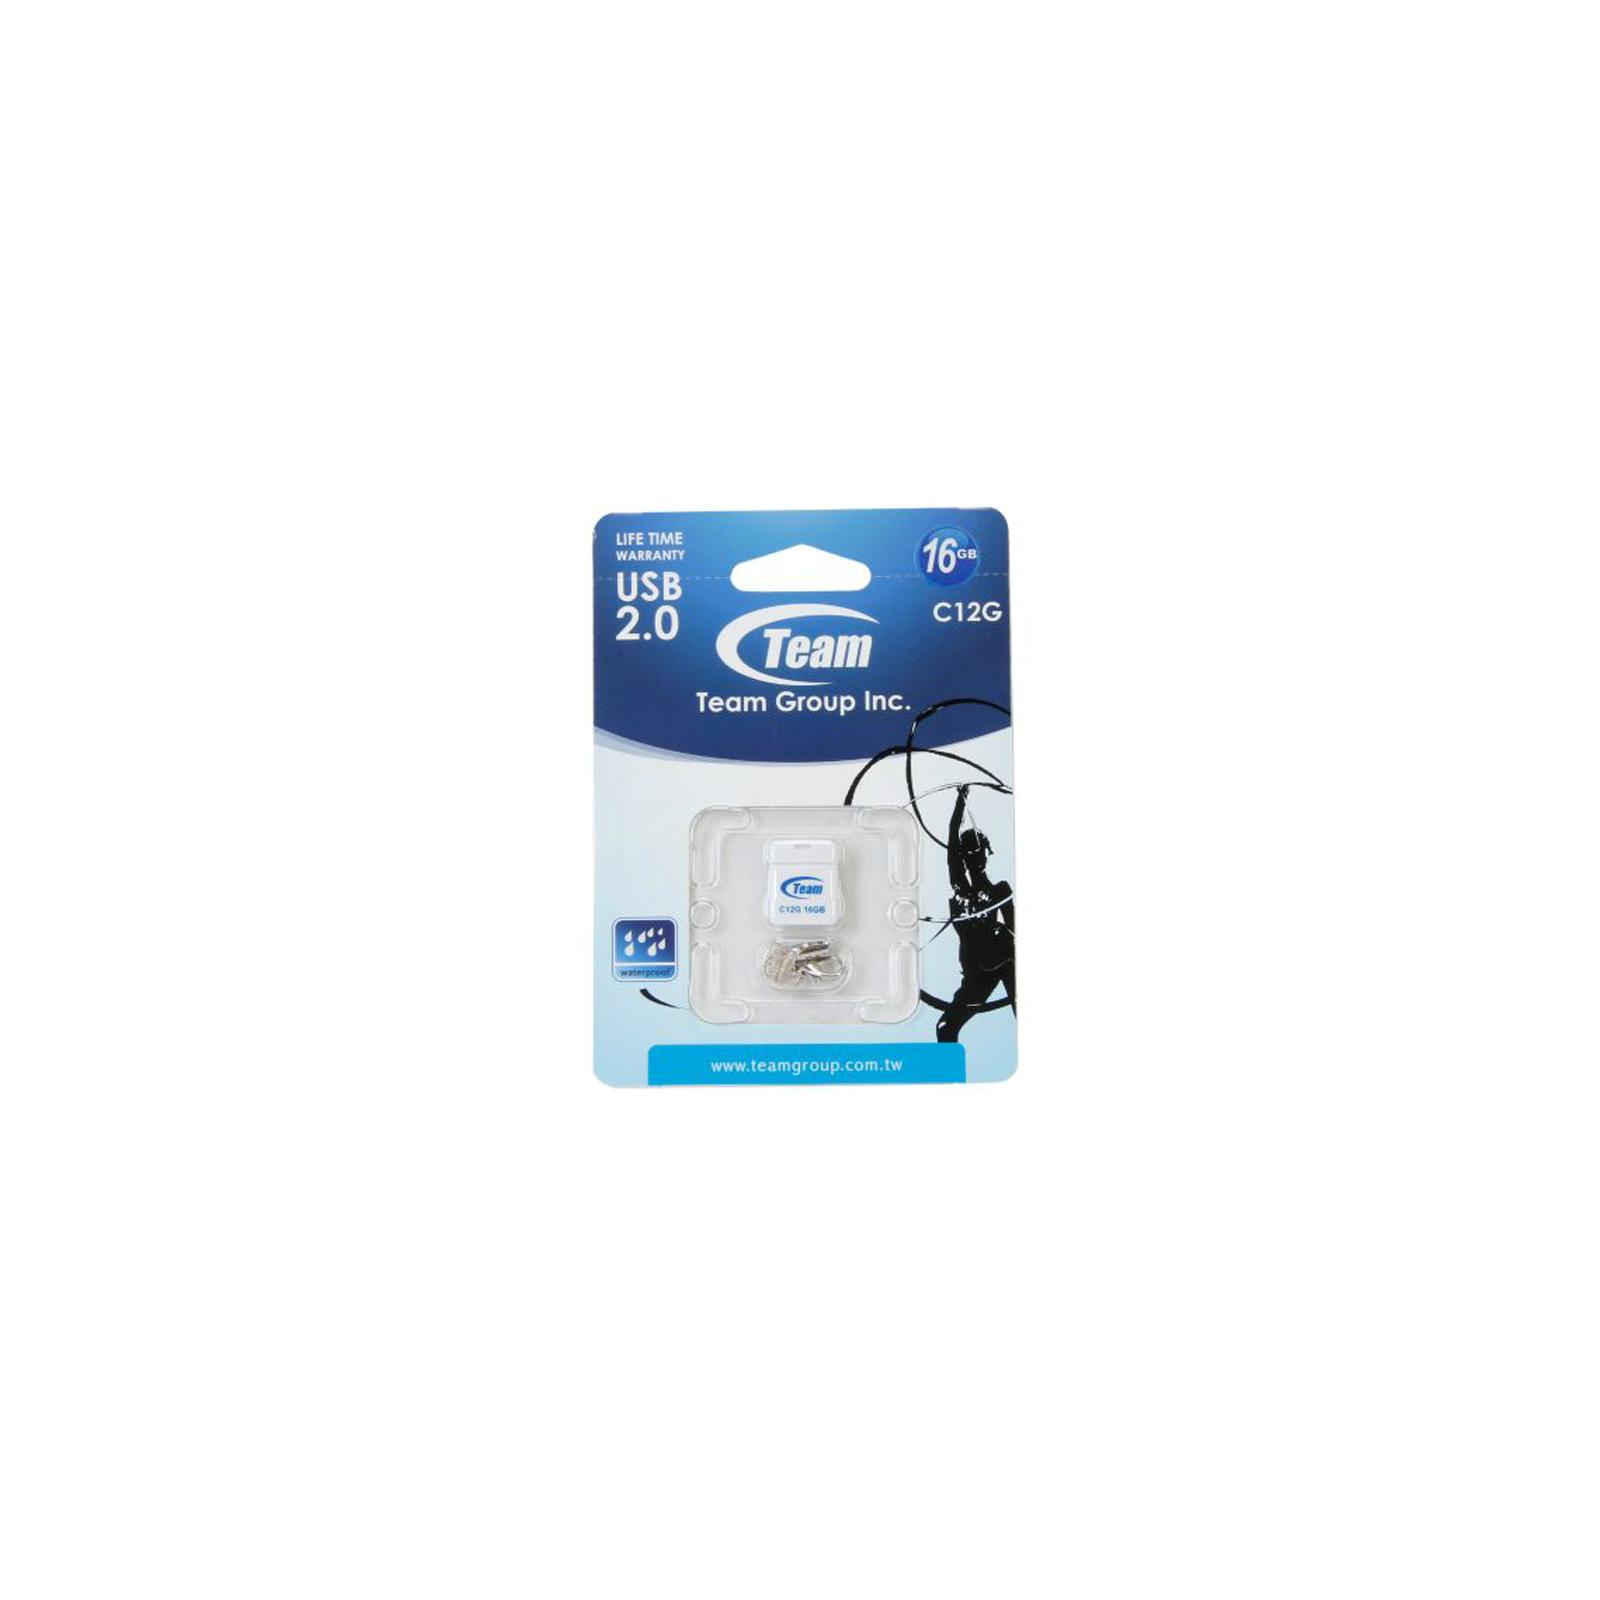 USB флеш накопитель Team 32GB C12G White USB 2.0 (TC12G32GW01) изображение 5